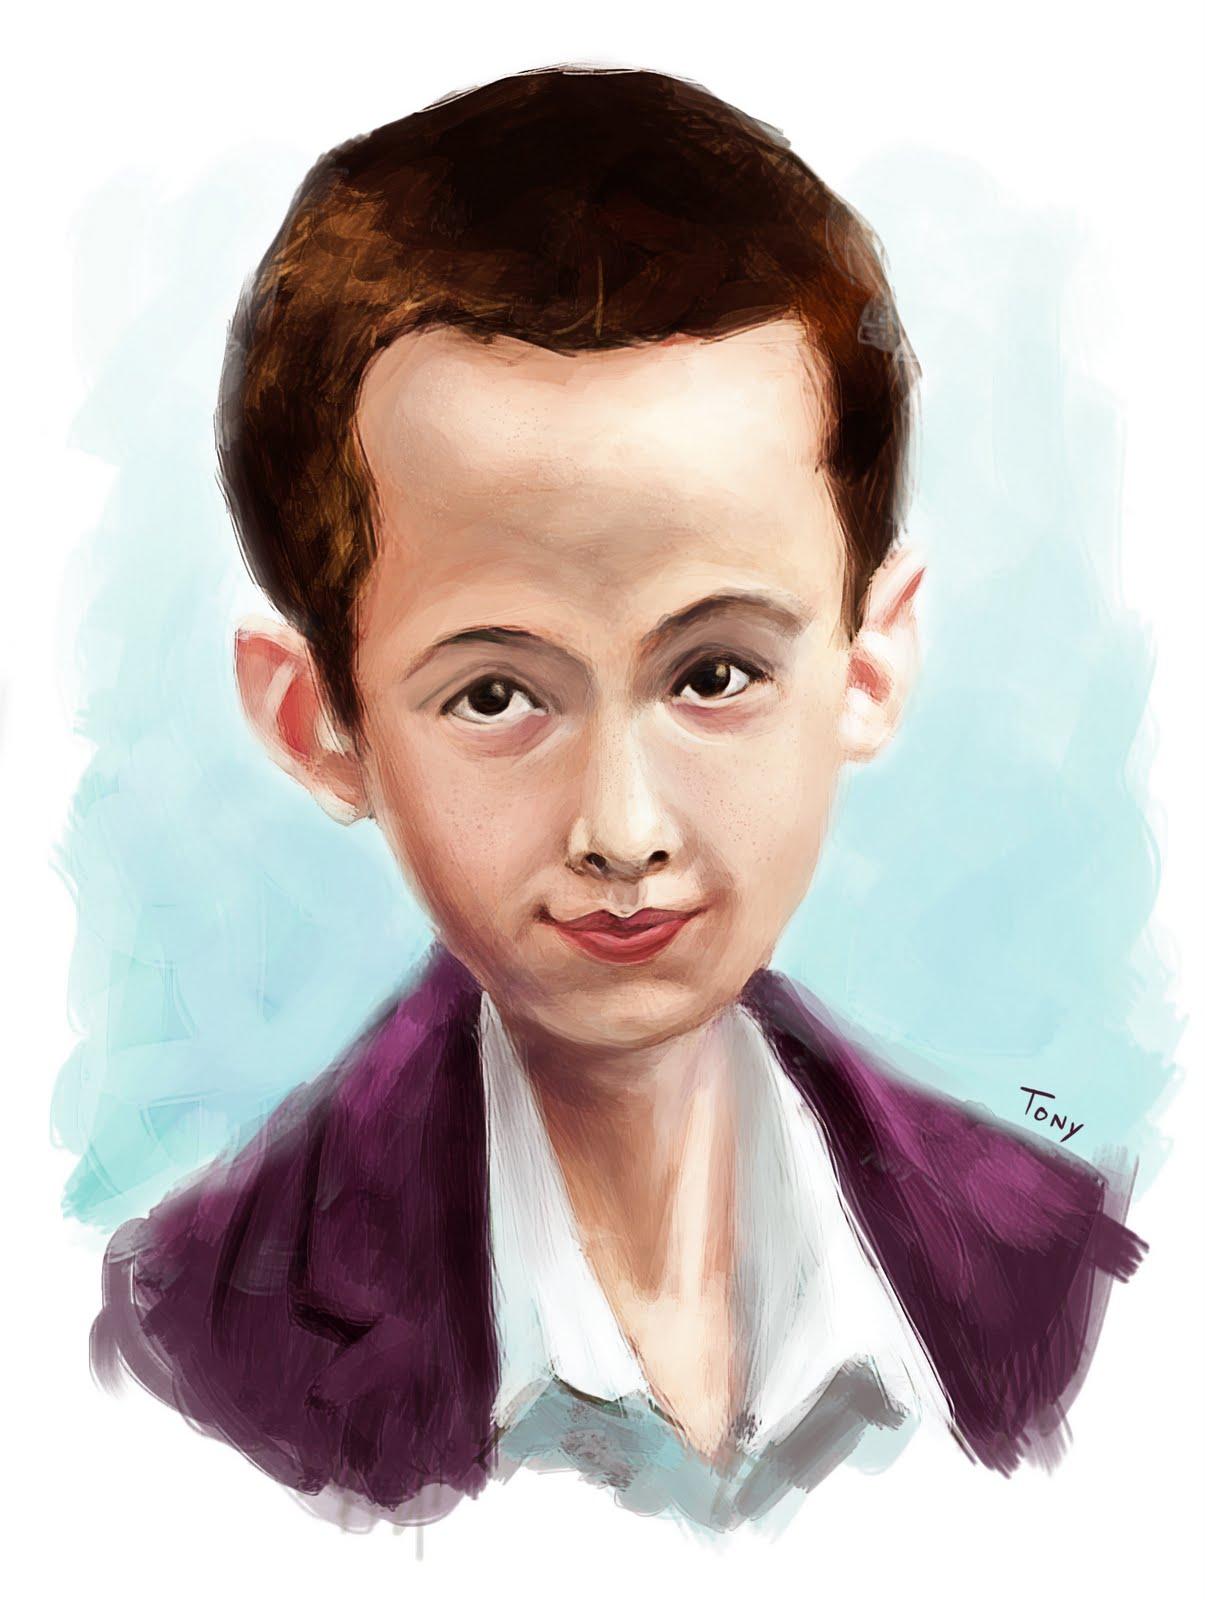 Tony Neto Sketchbook Kid